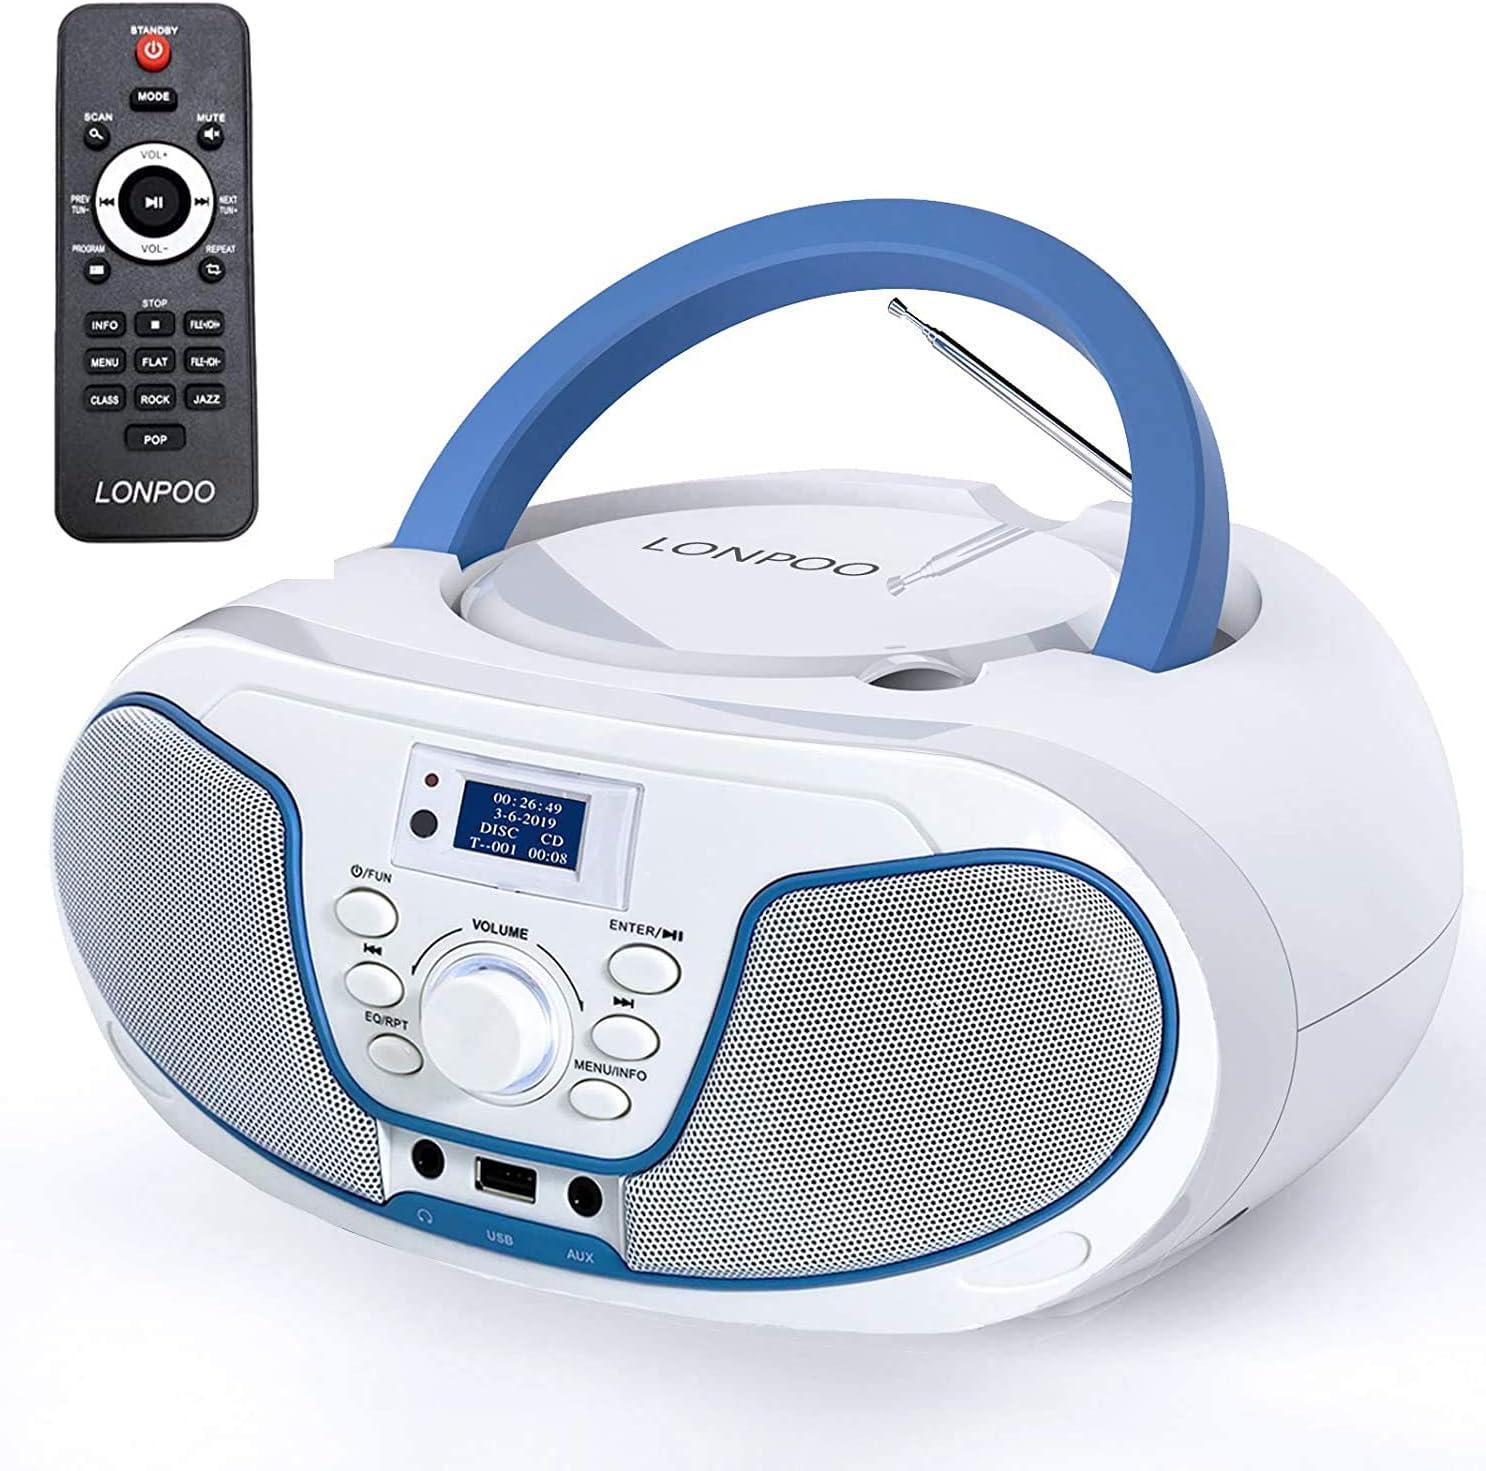 Lectores de CD portátiles,Radio CD / MP3 Portátil Reproductor CD con Bluetooth/FM/USB/AUX-IN/Salida de Auriculares/Estéreo Altavoz (LP-D02 Dab+)